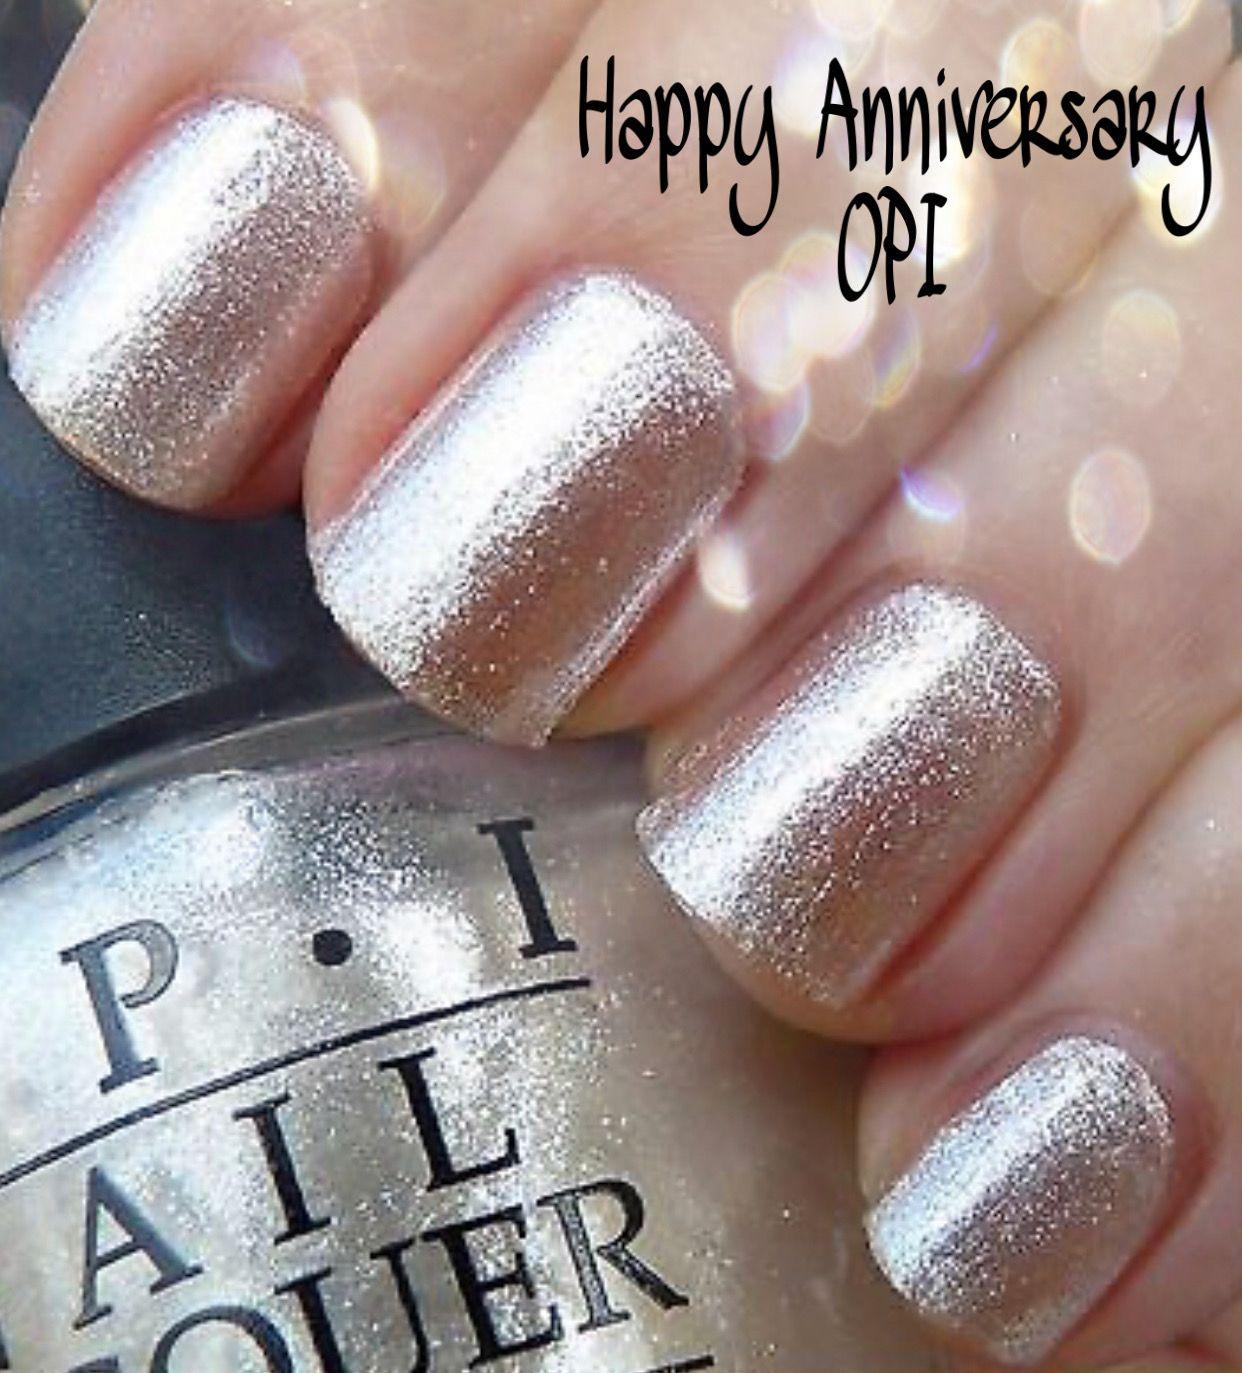 Happy Anniversary Opi Gel Polish Wedding Nails Moda Bella Salon Spa Wedding Nails Nail Polish Polish Wedding